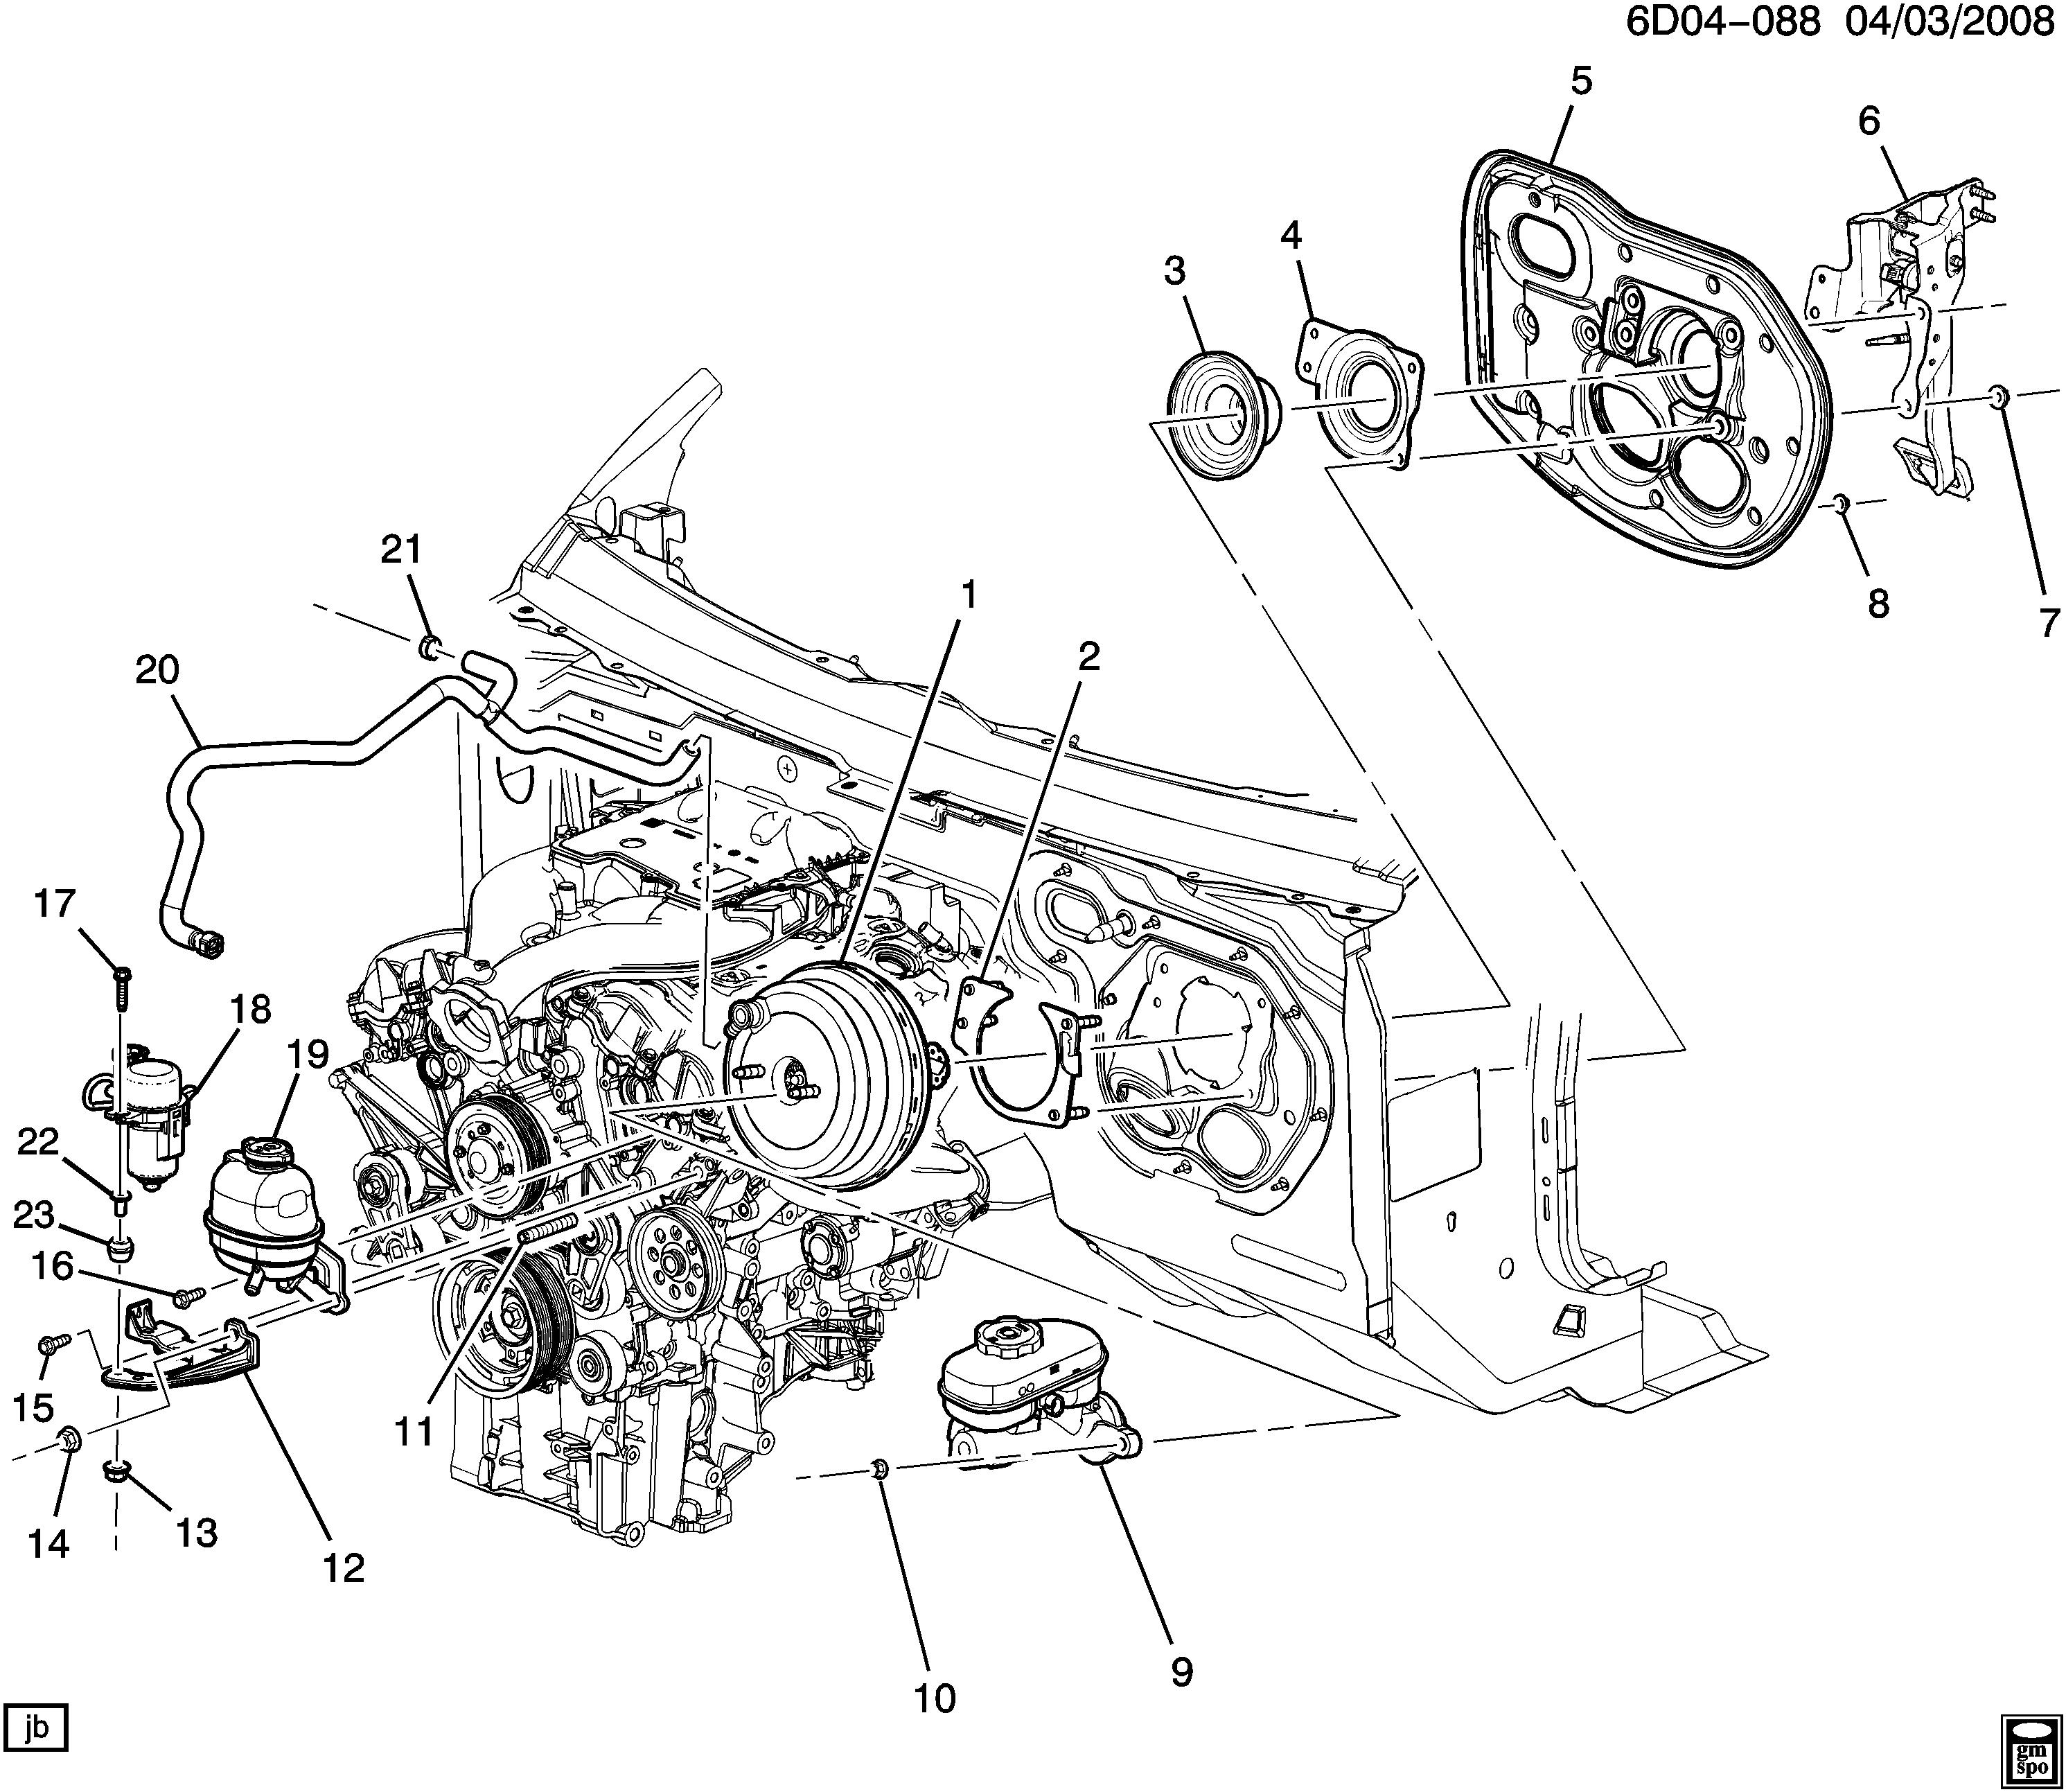 2004 cadillac cts parts list